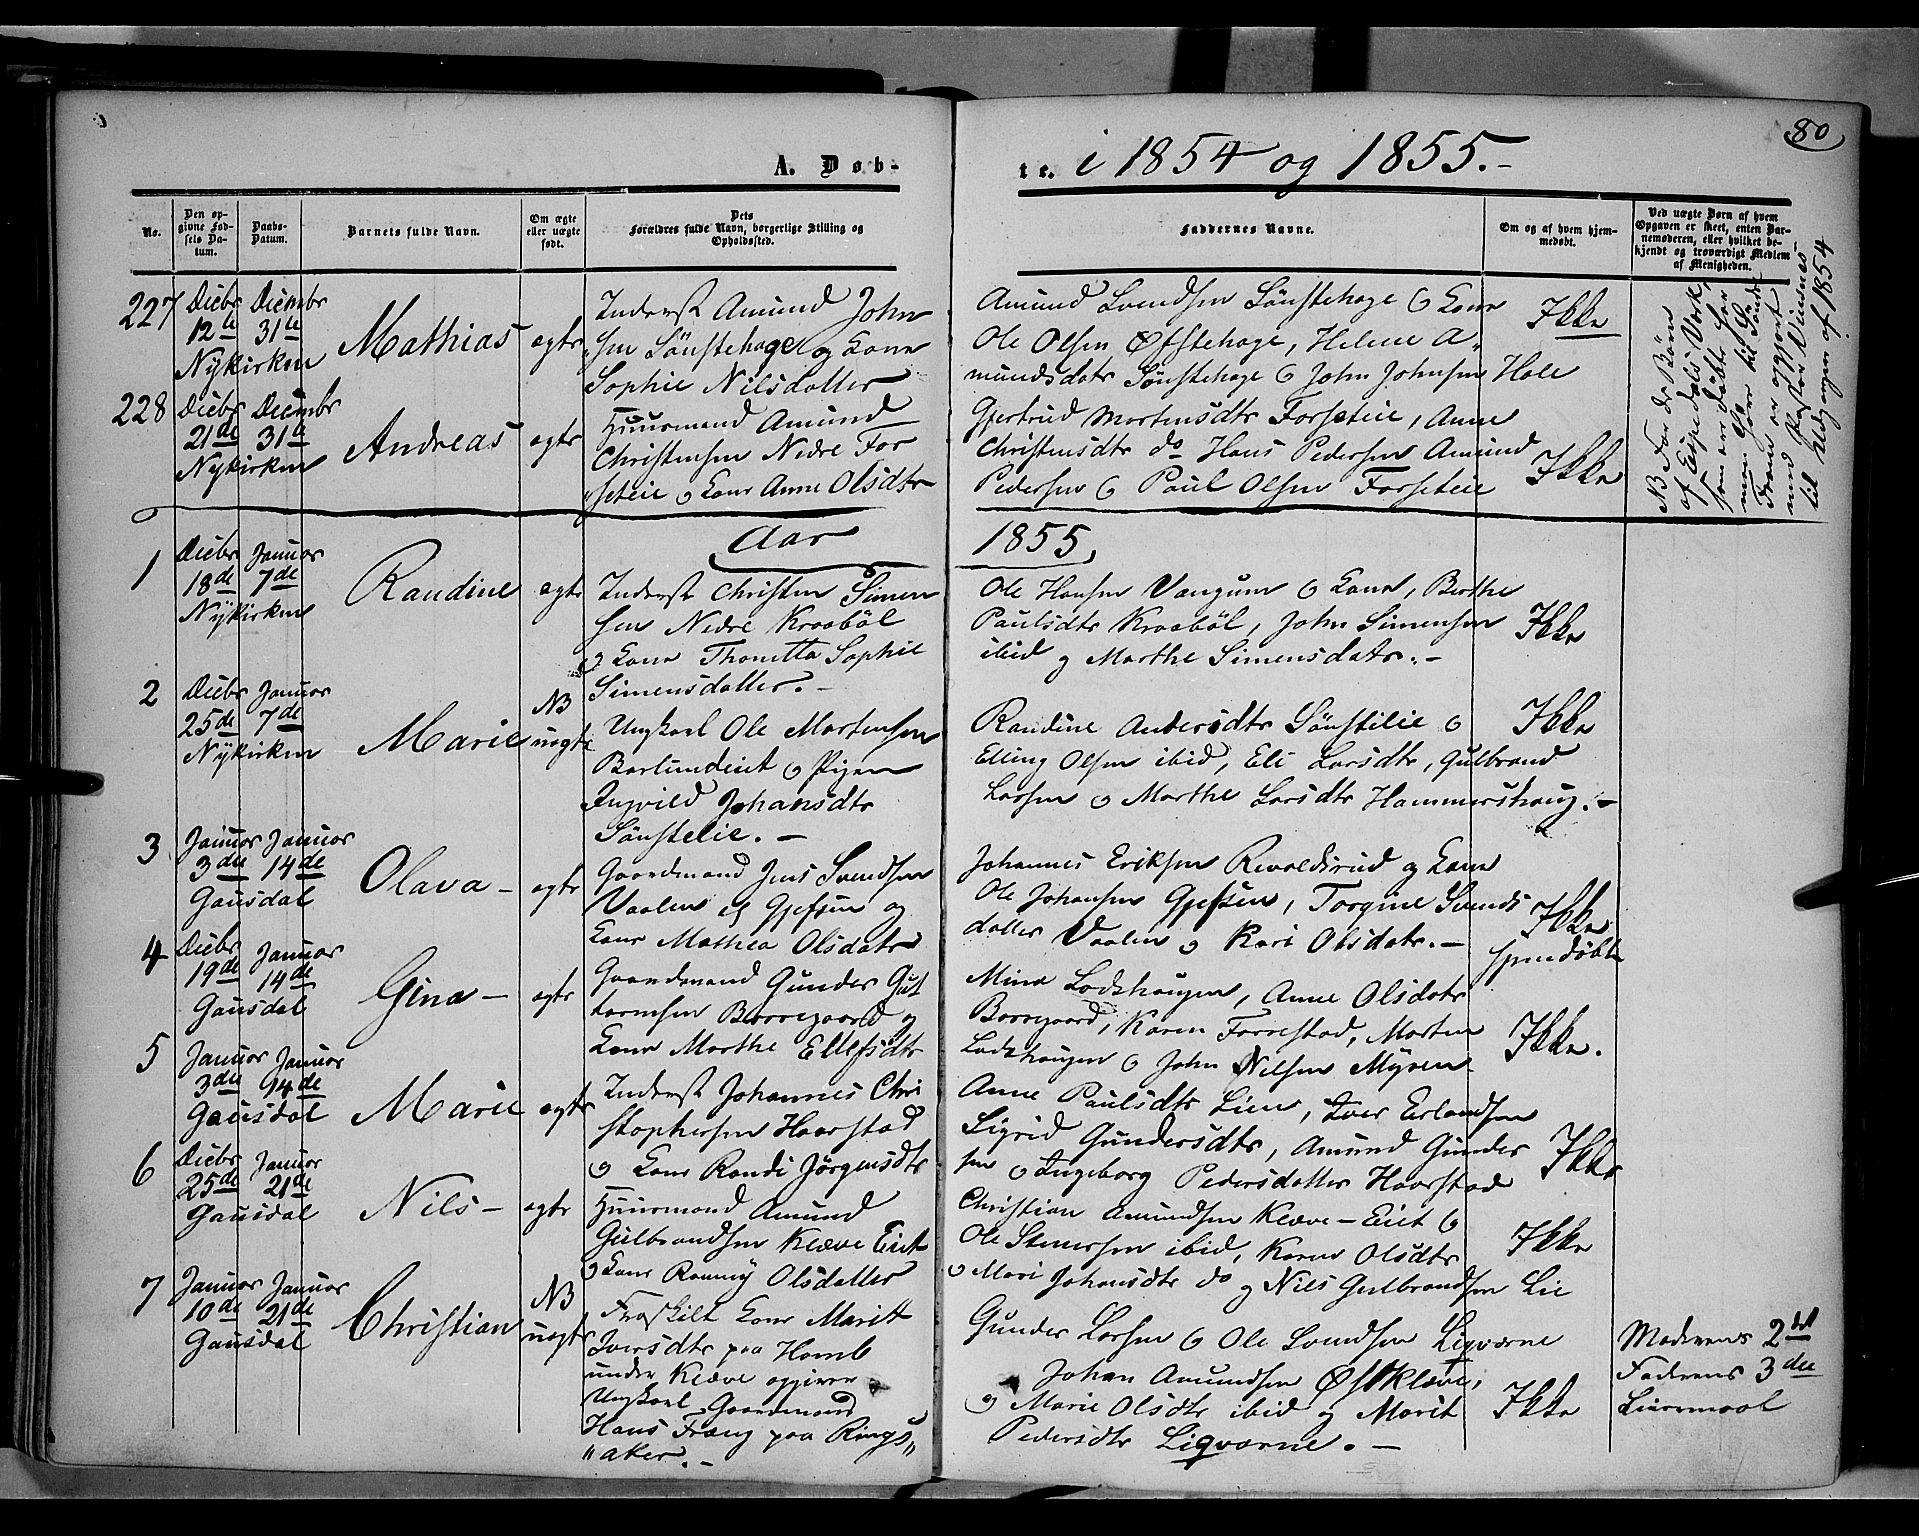 SAH, Gausdal prestekontor, Ministerialbok nr. 8, 1850-1861, s. 80